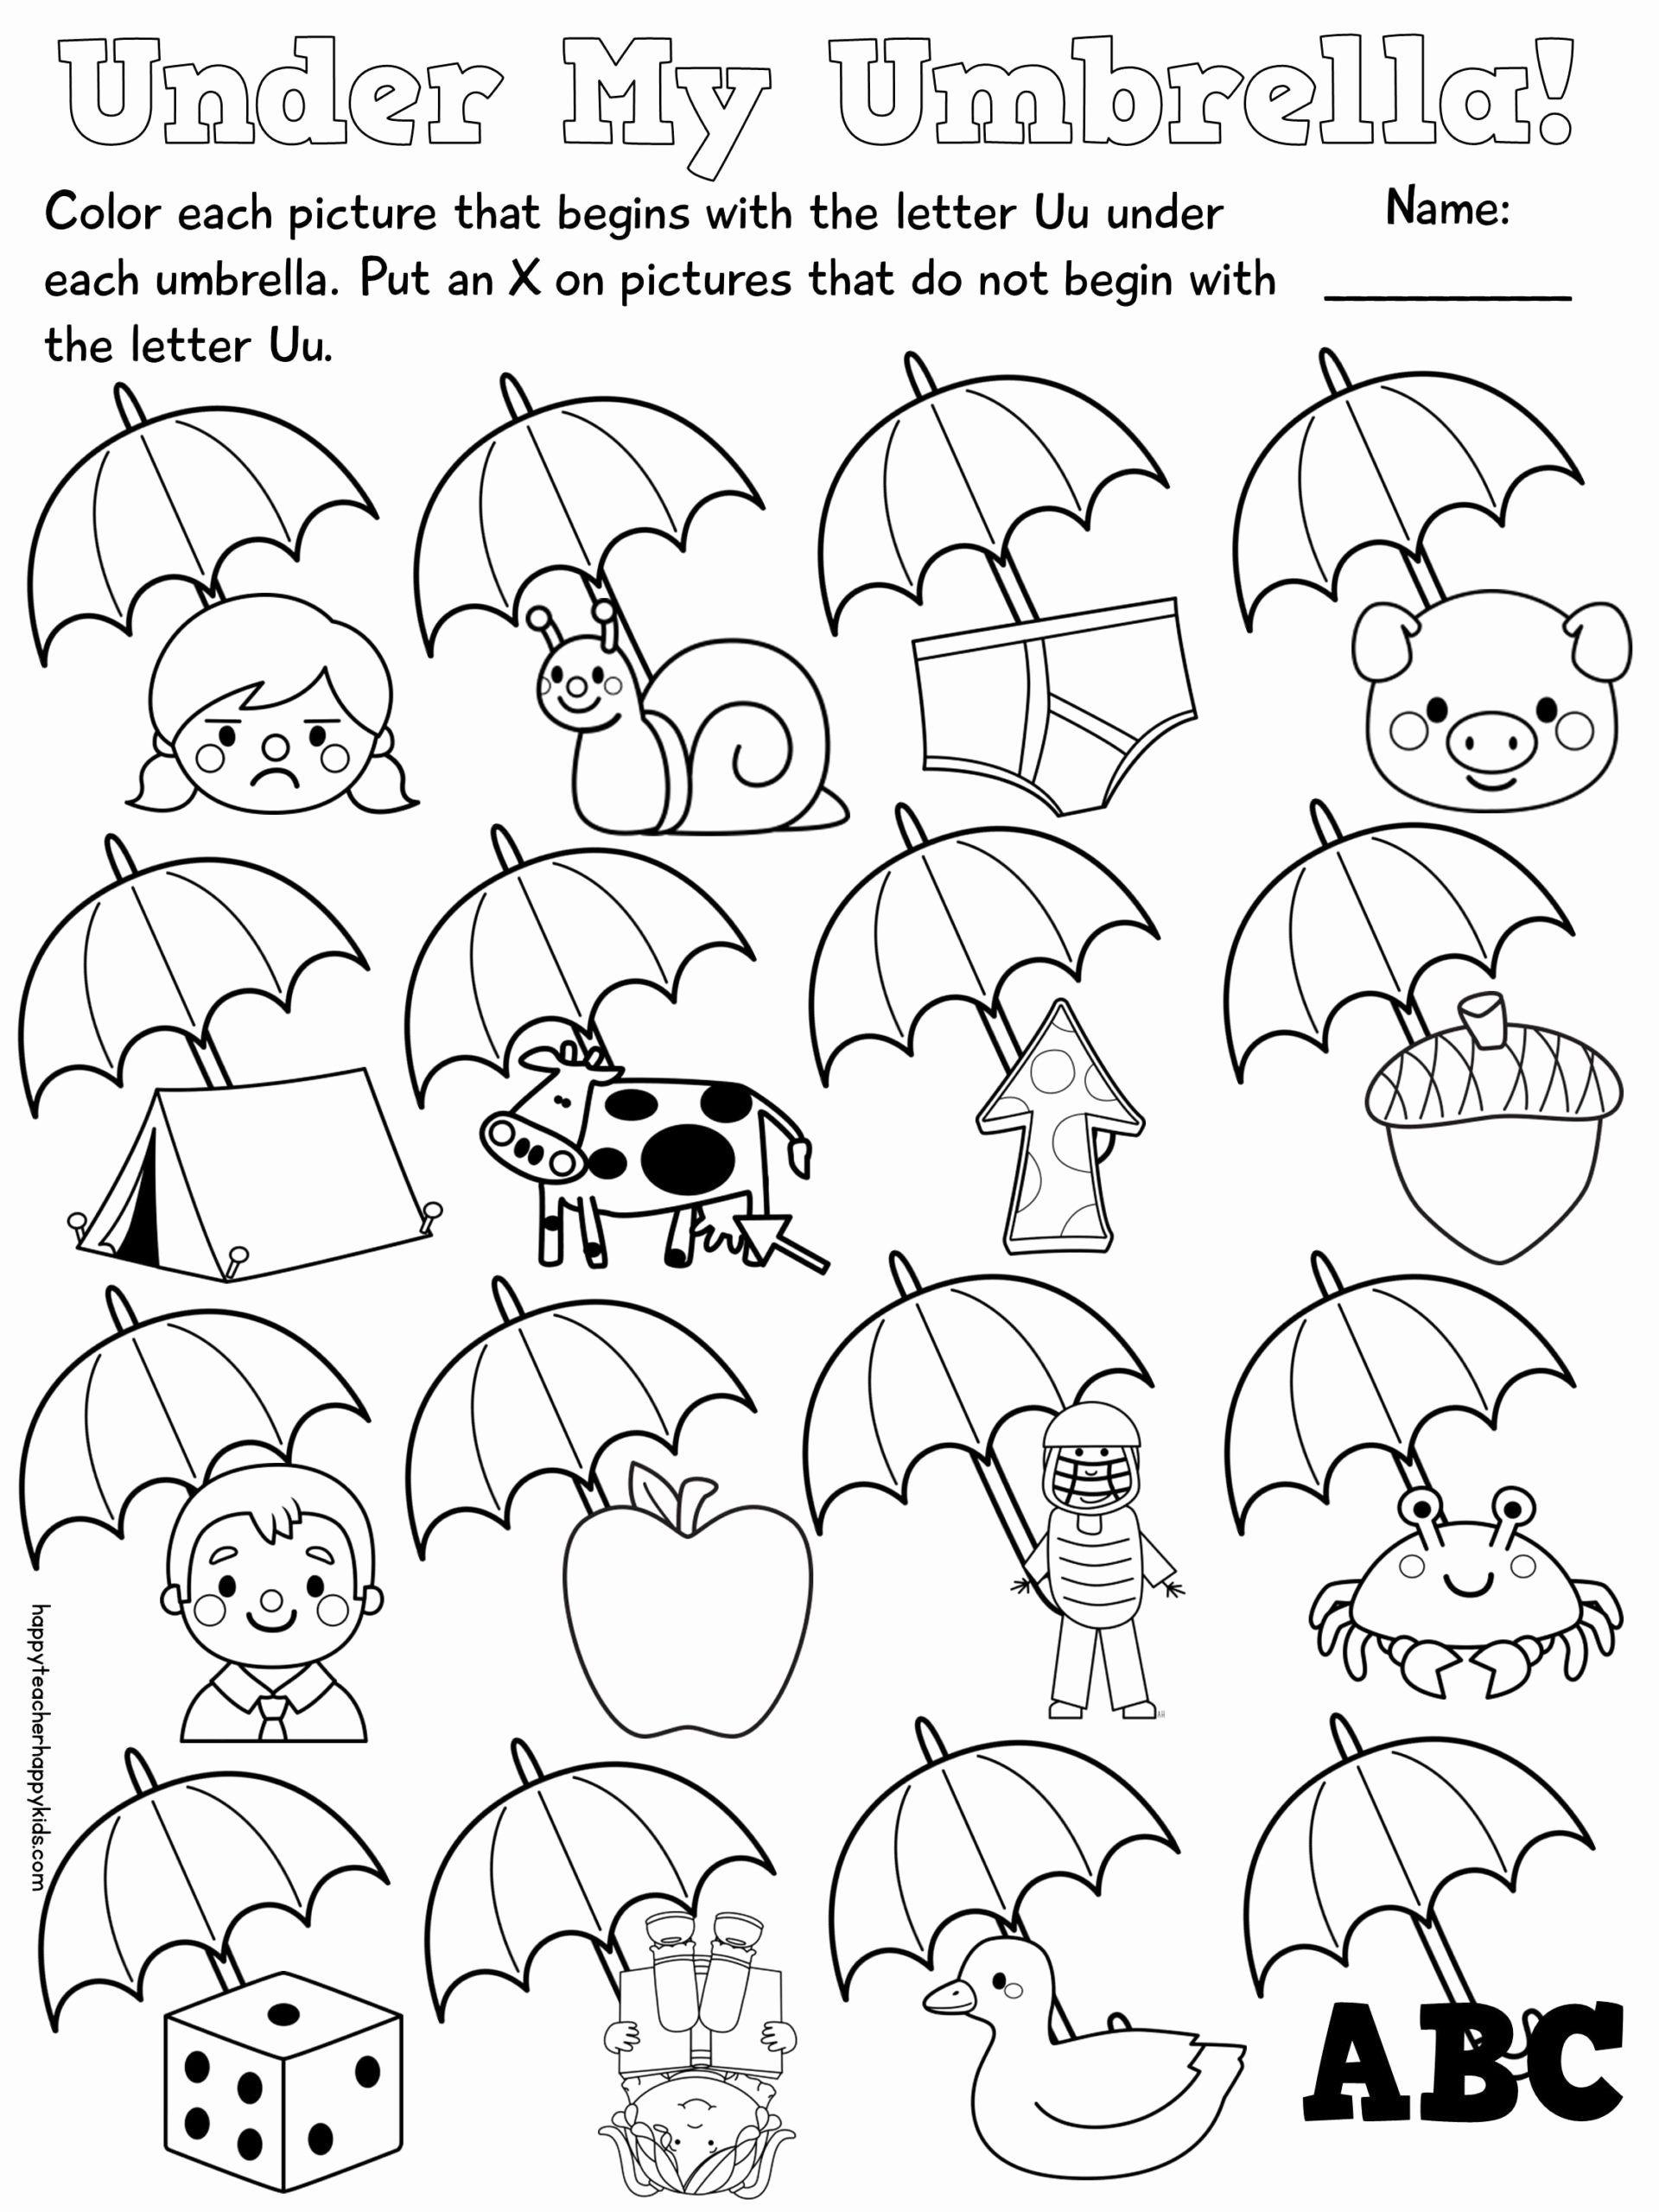 Polar Bear Worksheets For Preschoolers Inspirational Worksheet 1st Grade Phonics Worksheets Phonics Worksheets Kindergarten Worksheets Printable Jolly Phonics Letter u worksheets for toddlers